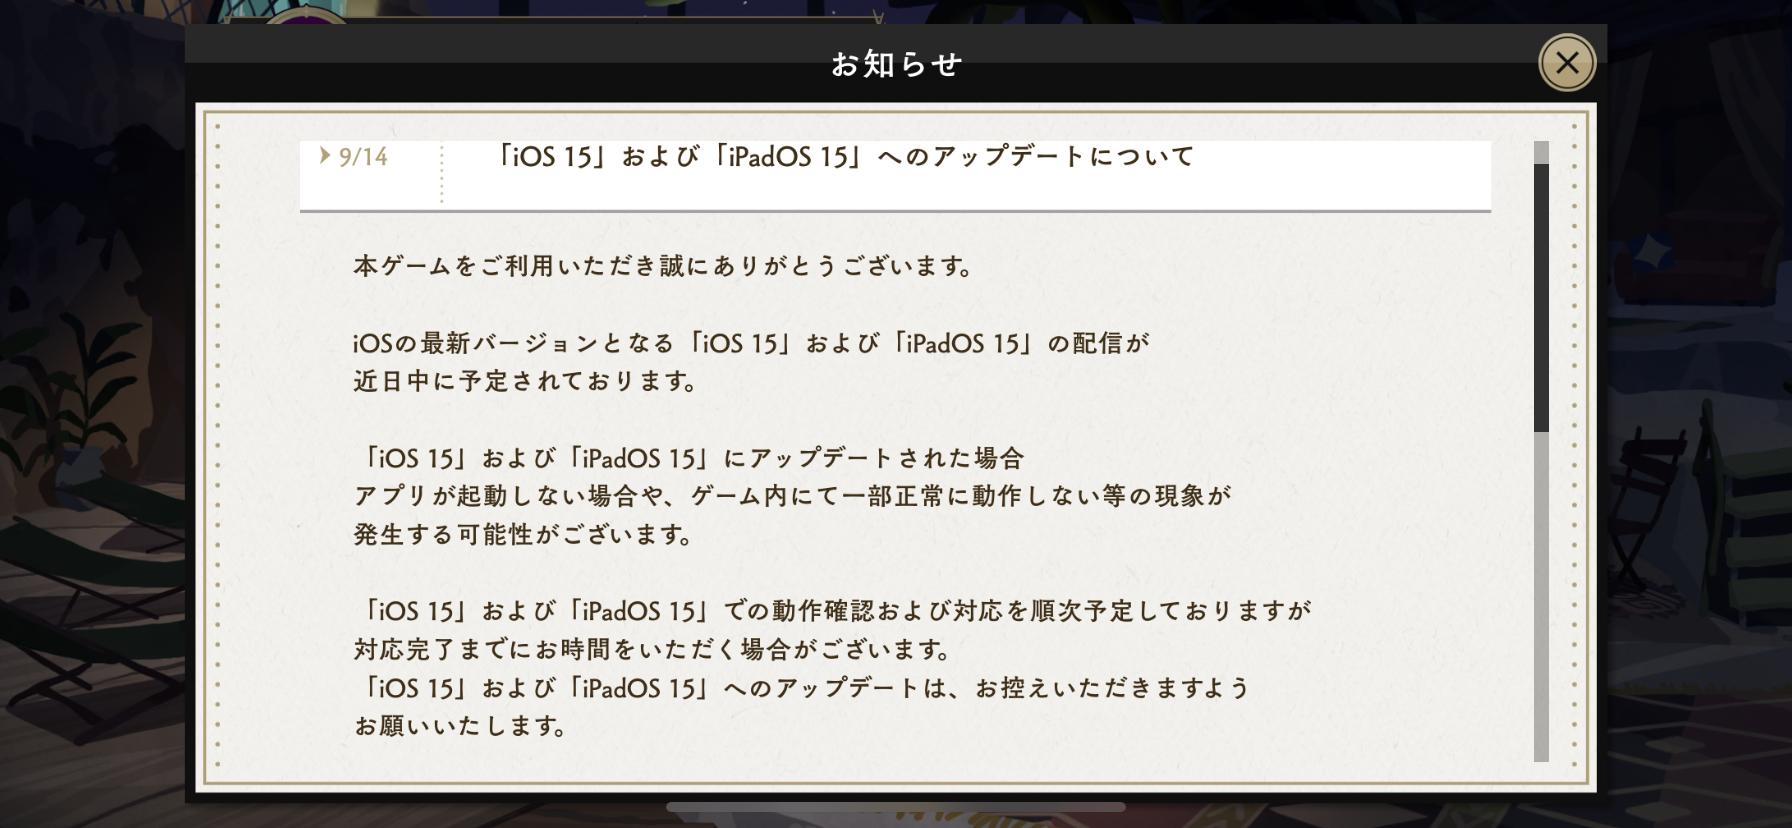 f:id:motimoti444:20210915143229p:plain